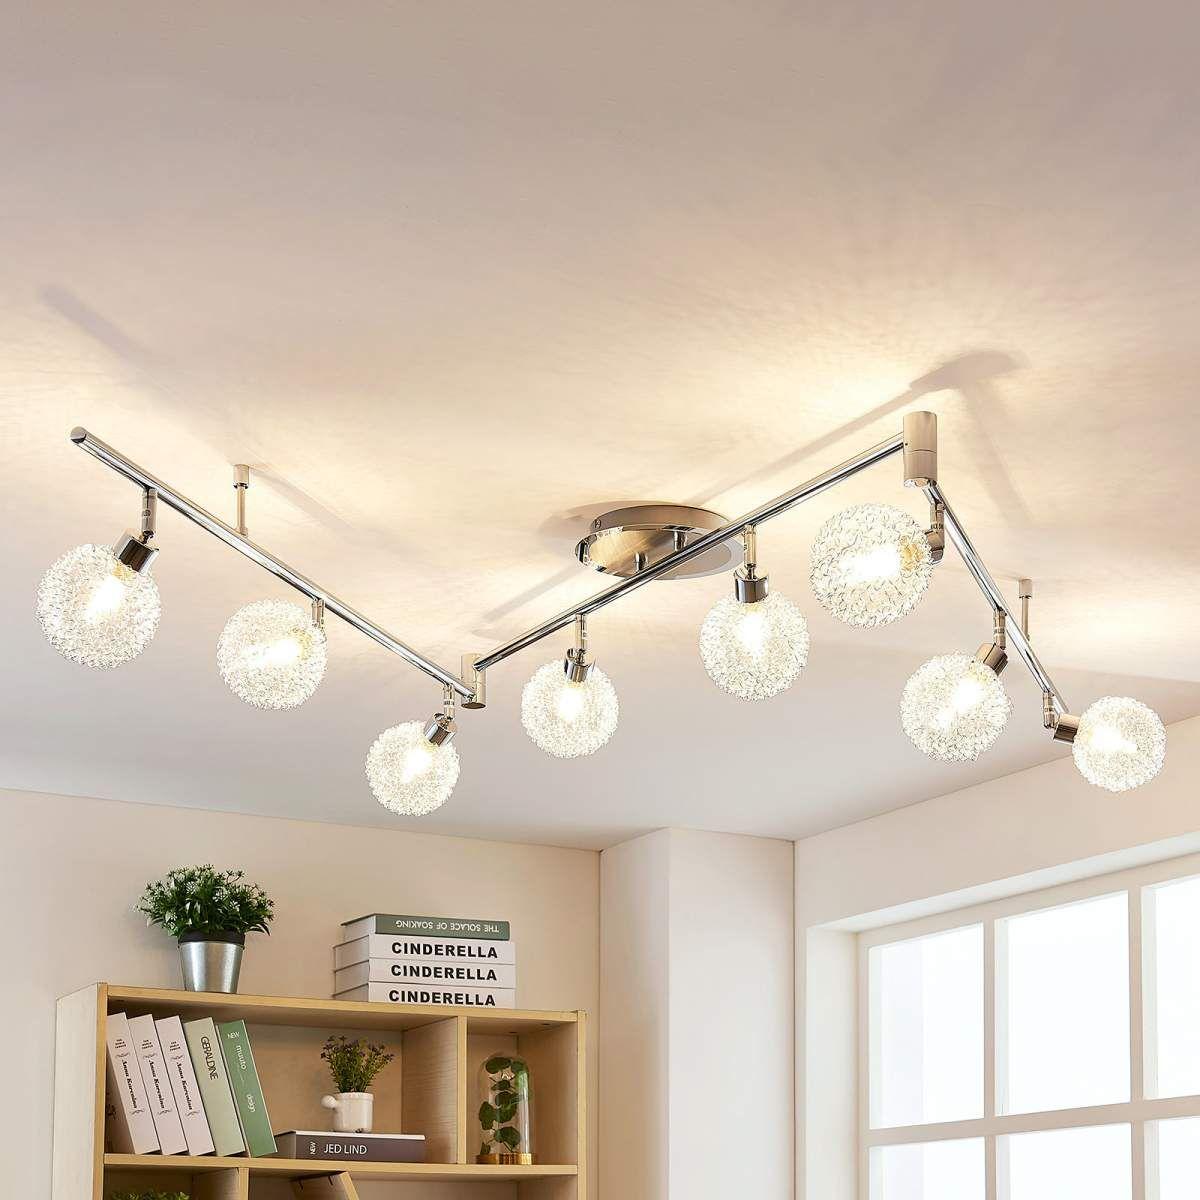 LED Decken Lampe Landhaus Stil Ess Zimmer Beleuchtung